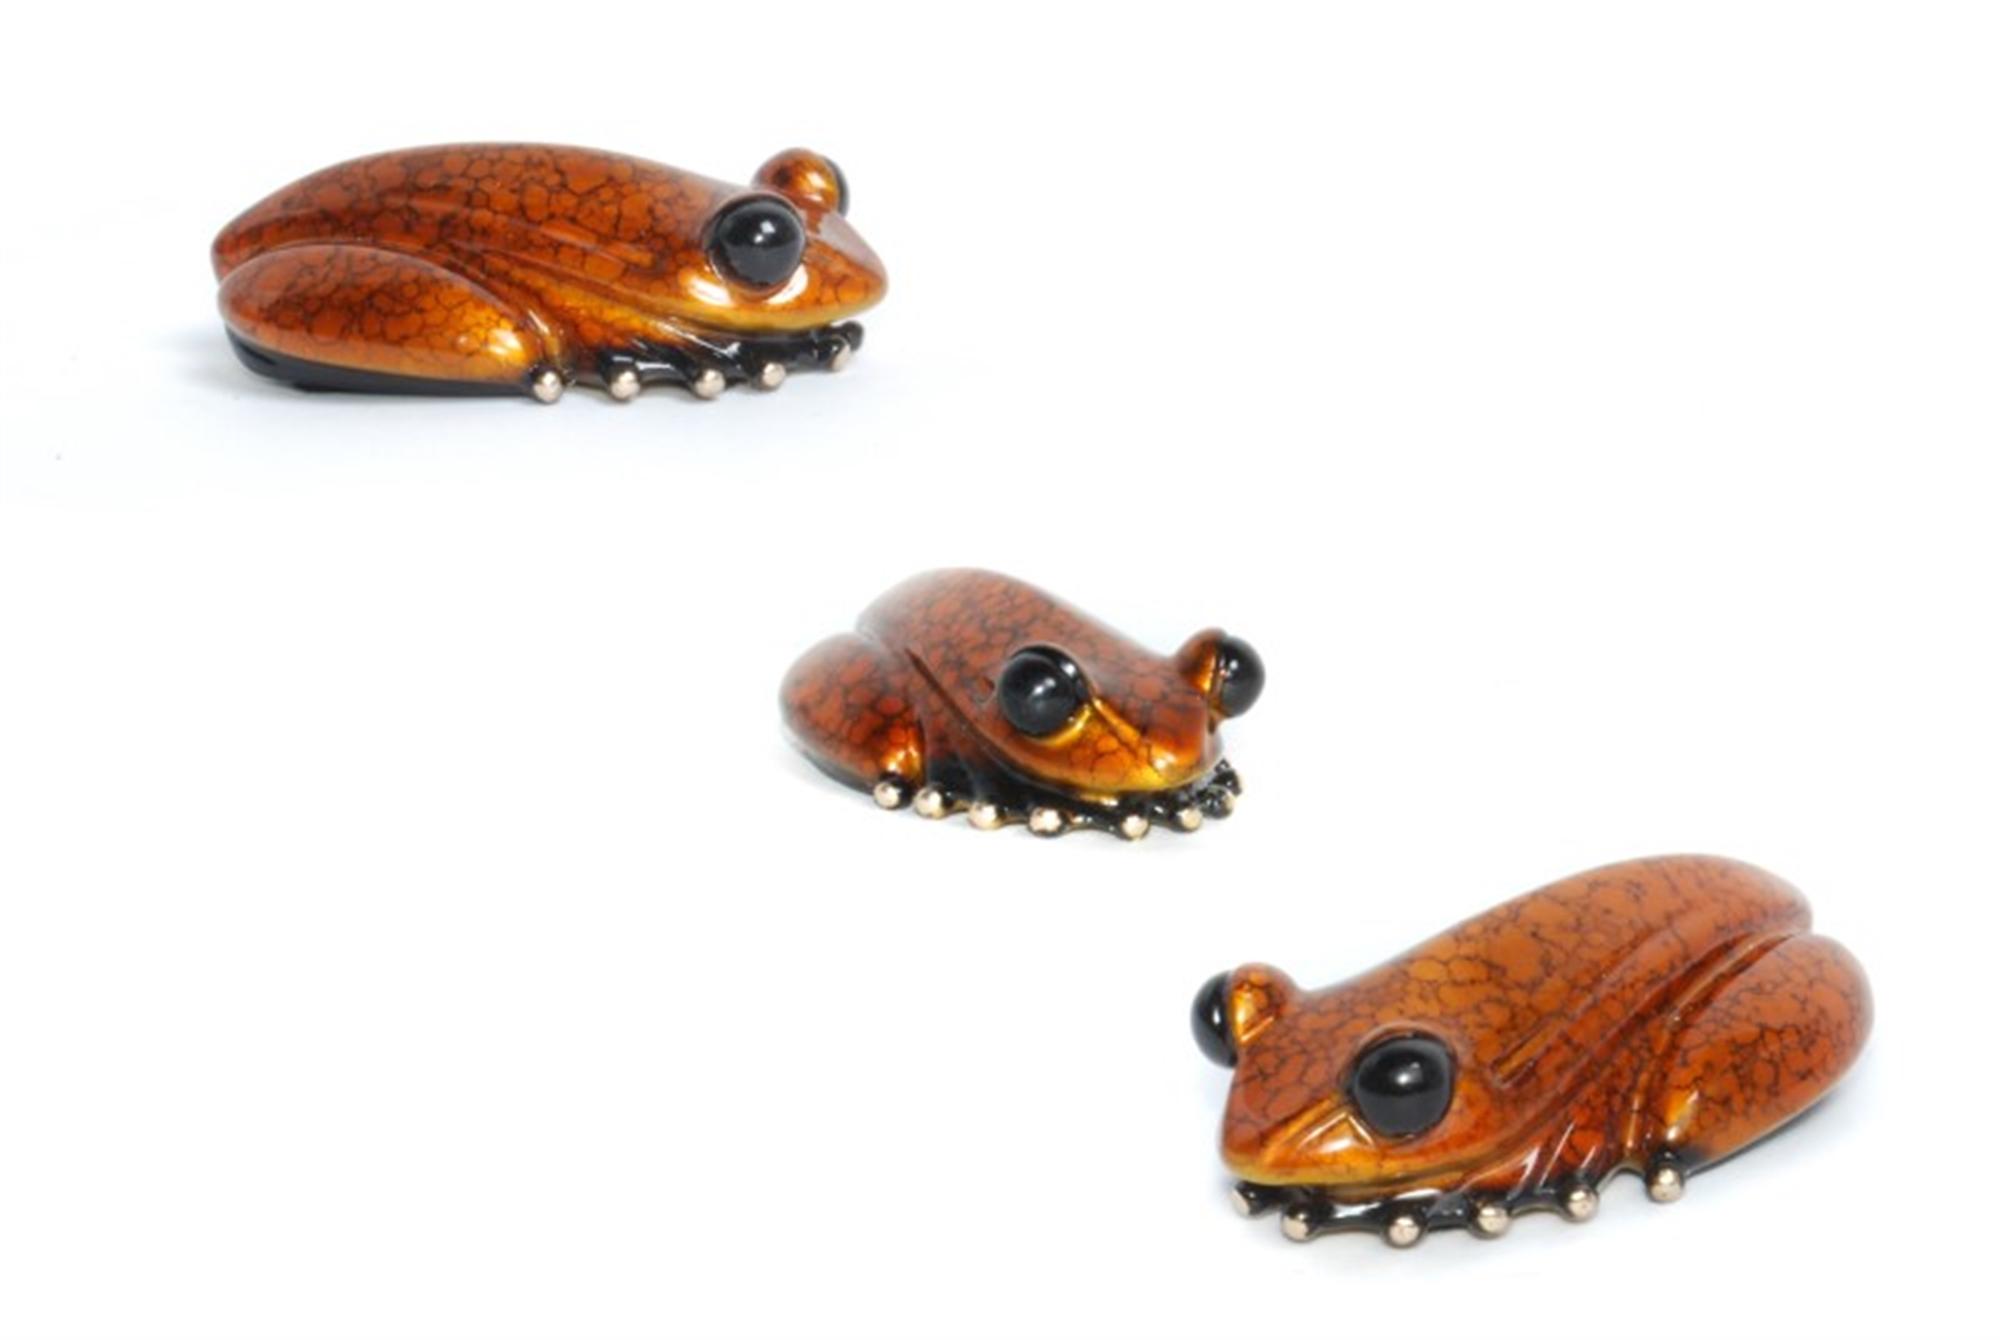 Gumdrop by The Frogman